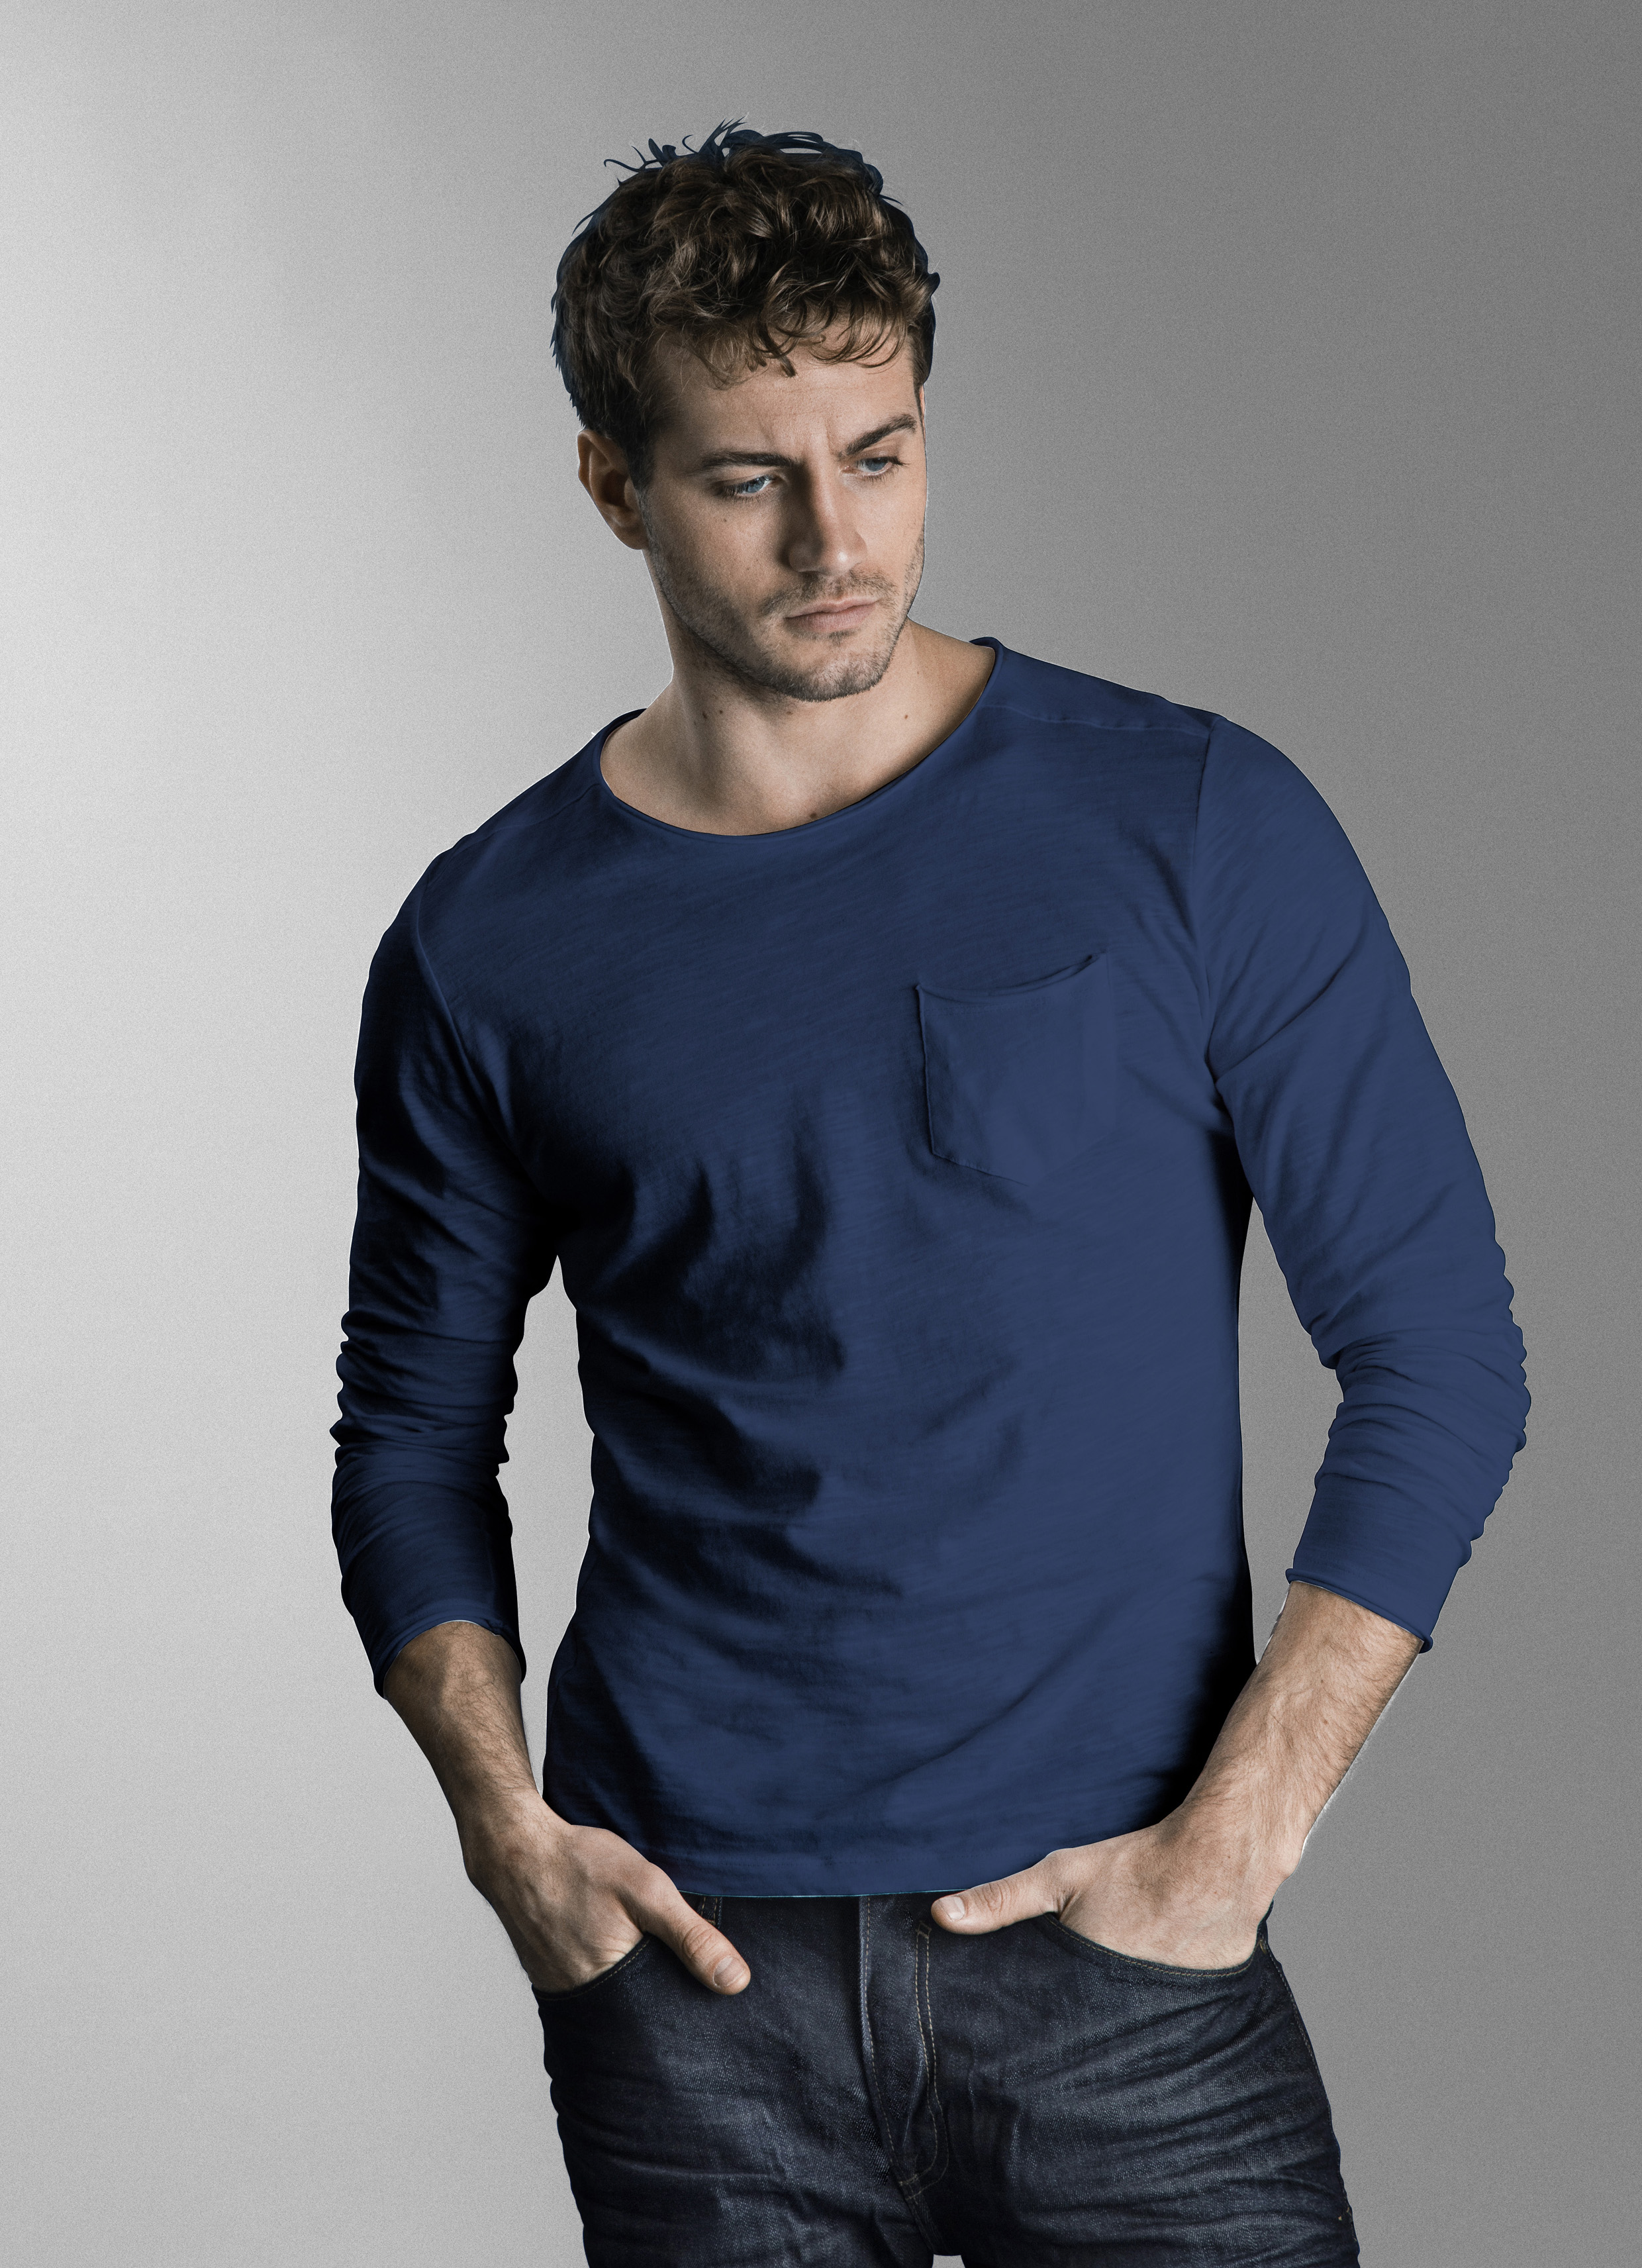 Midnight Blue BHNICOLAI Long sleeved T-shirt fra Blend He – Køb Midnight Blue BHNICOLAI Long sleeved T-shirt fra str. S-3XL her